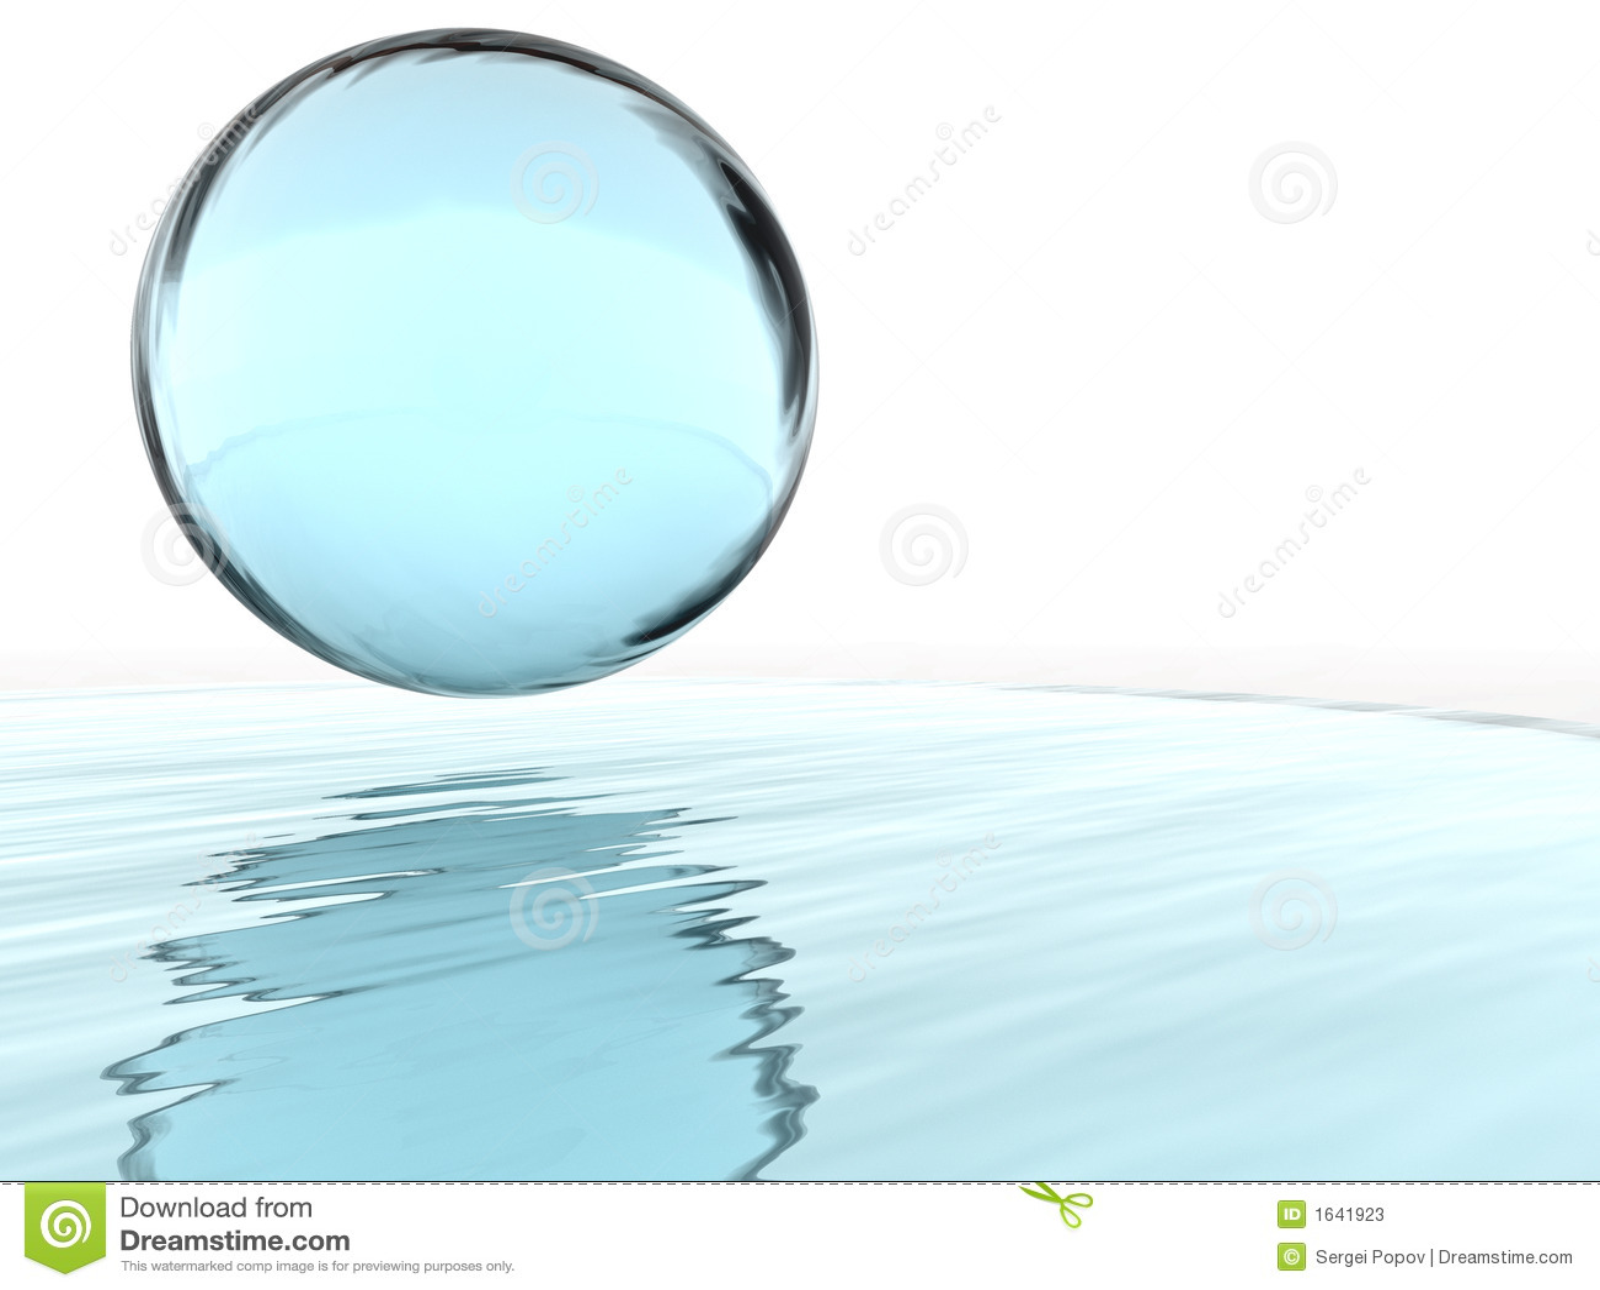 Liquid ball